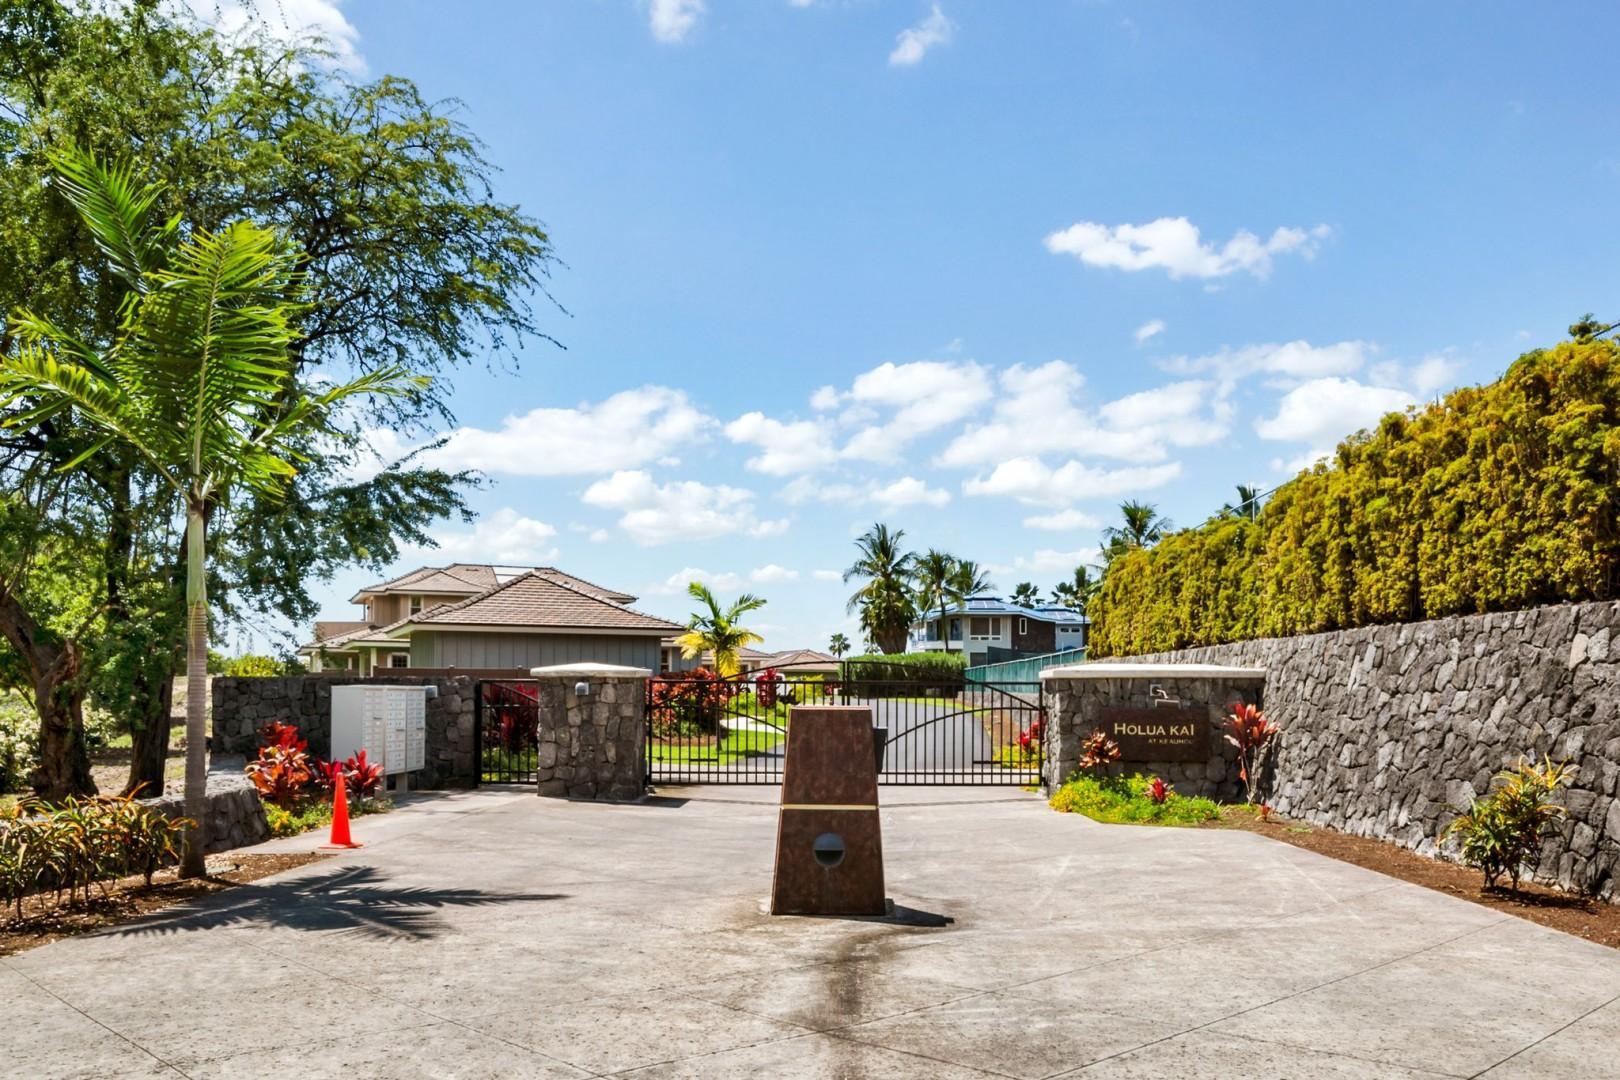 Holua Kai gated entry